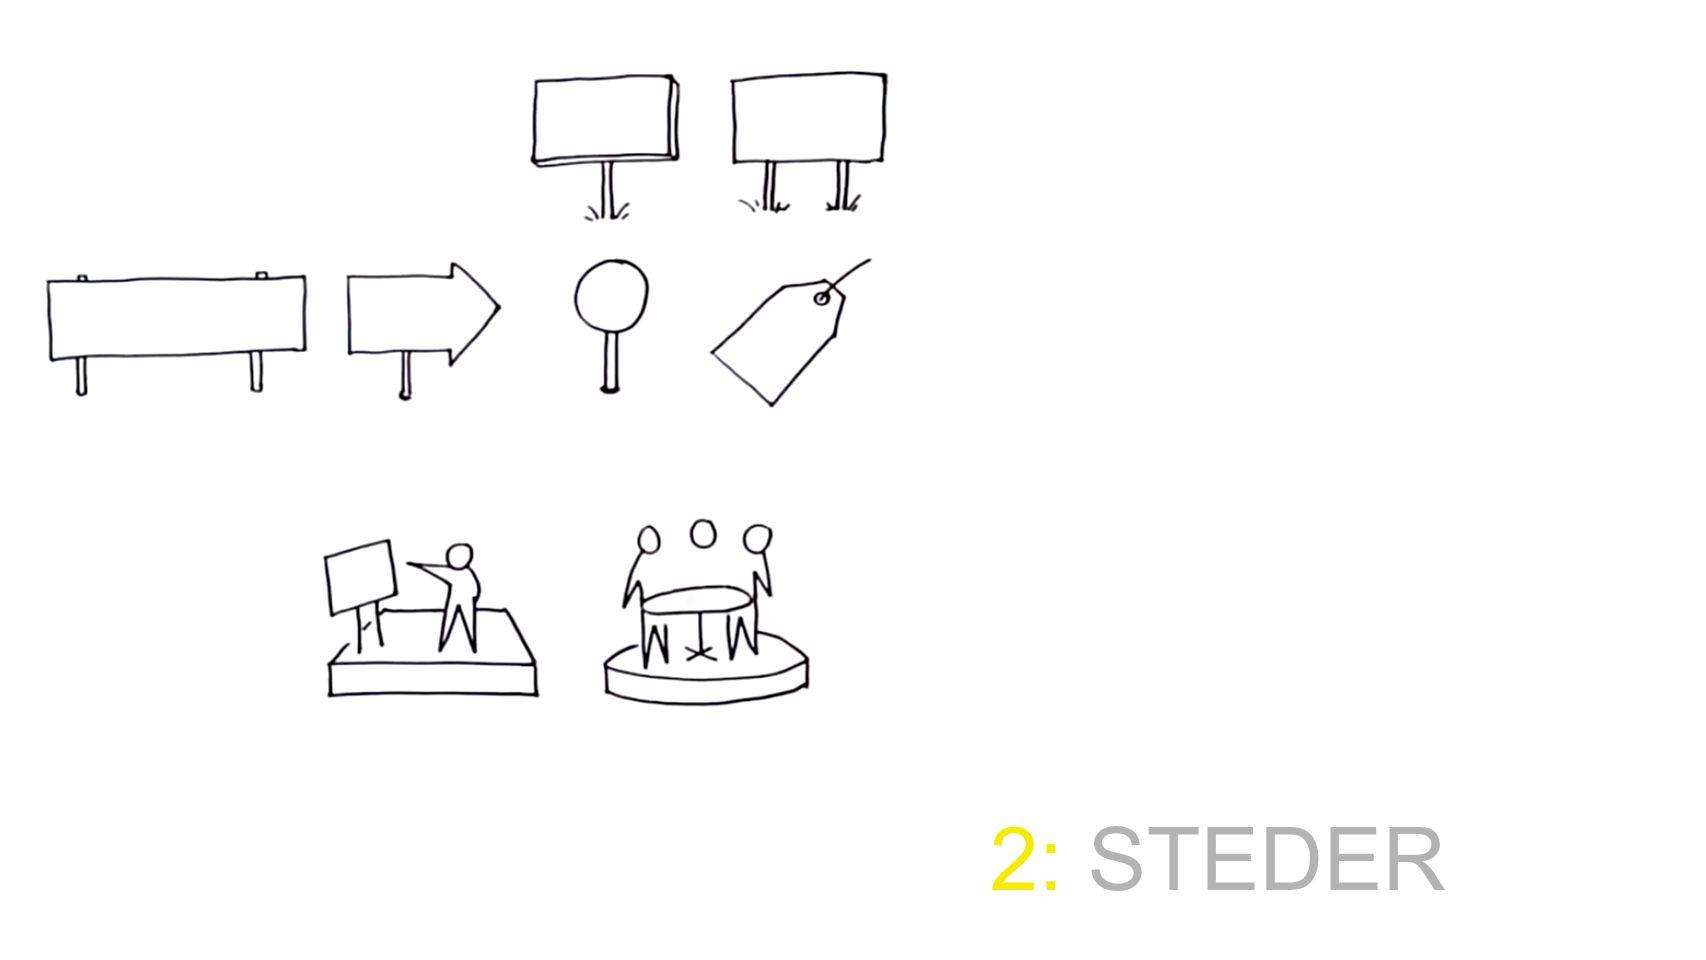 2: STEDER